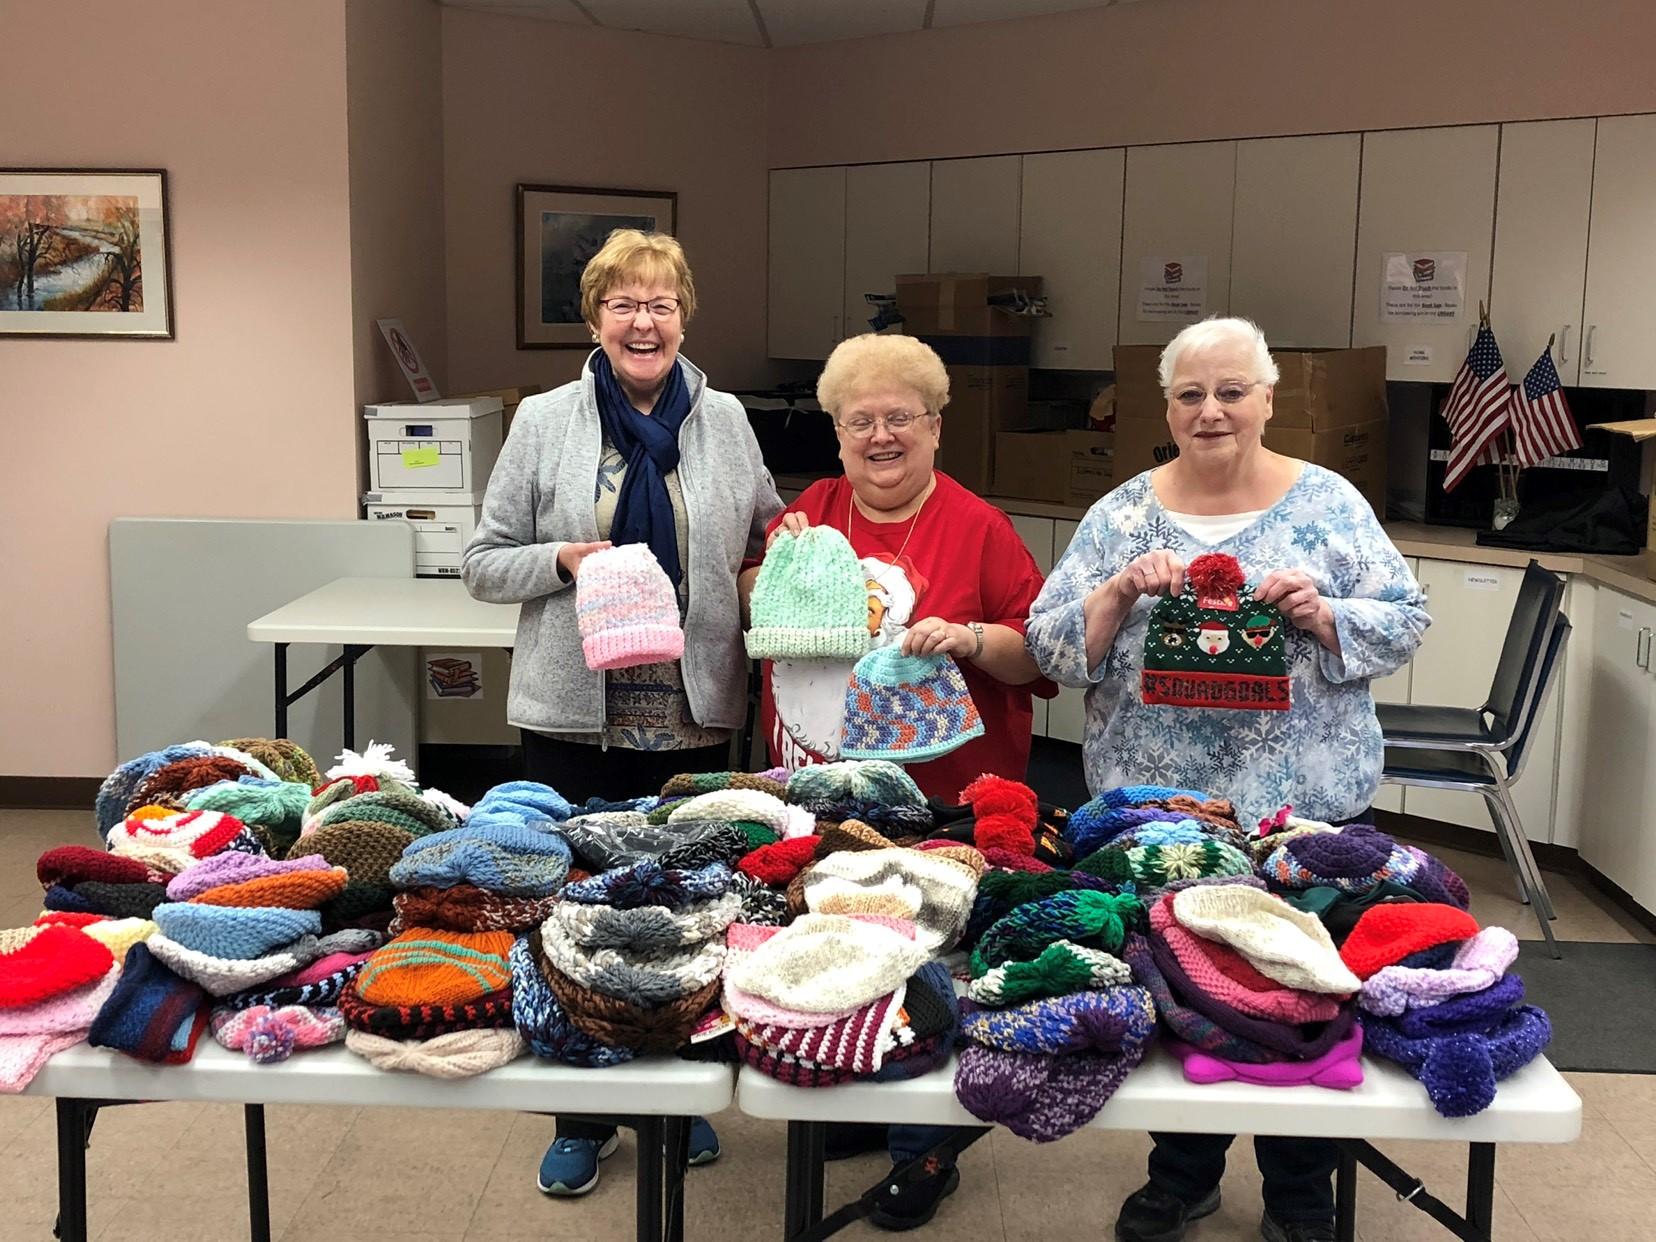 Women holding knit hats